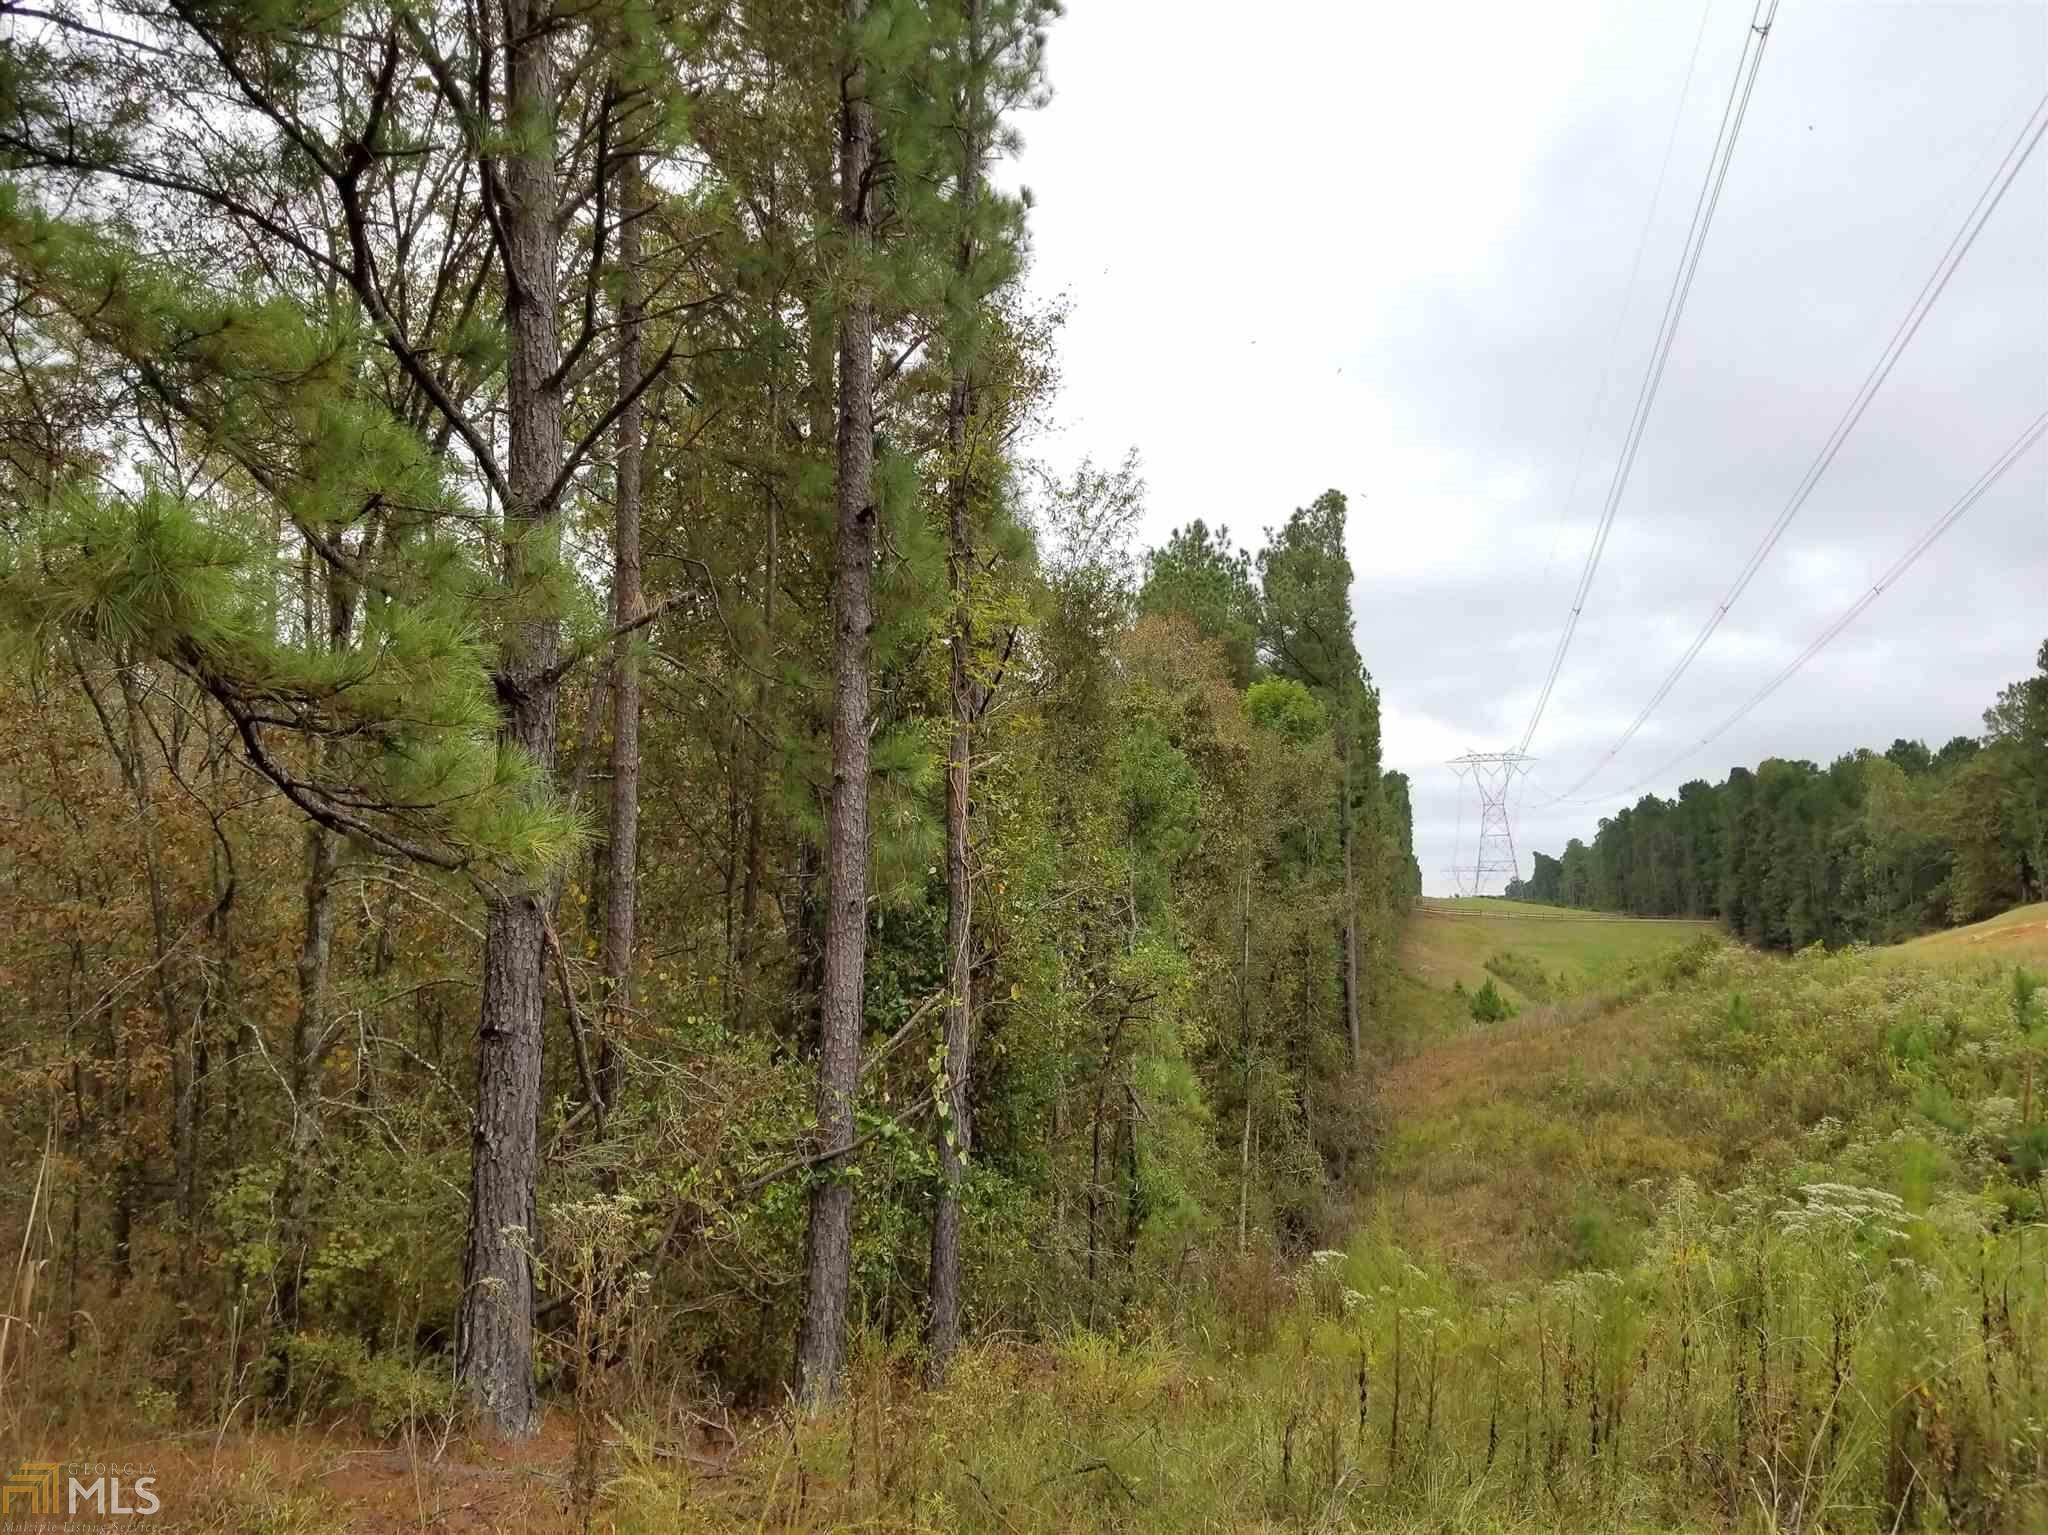 8 69 acres in Juliette for $98,000